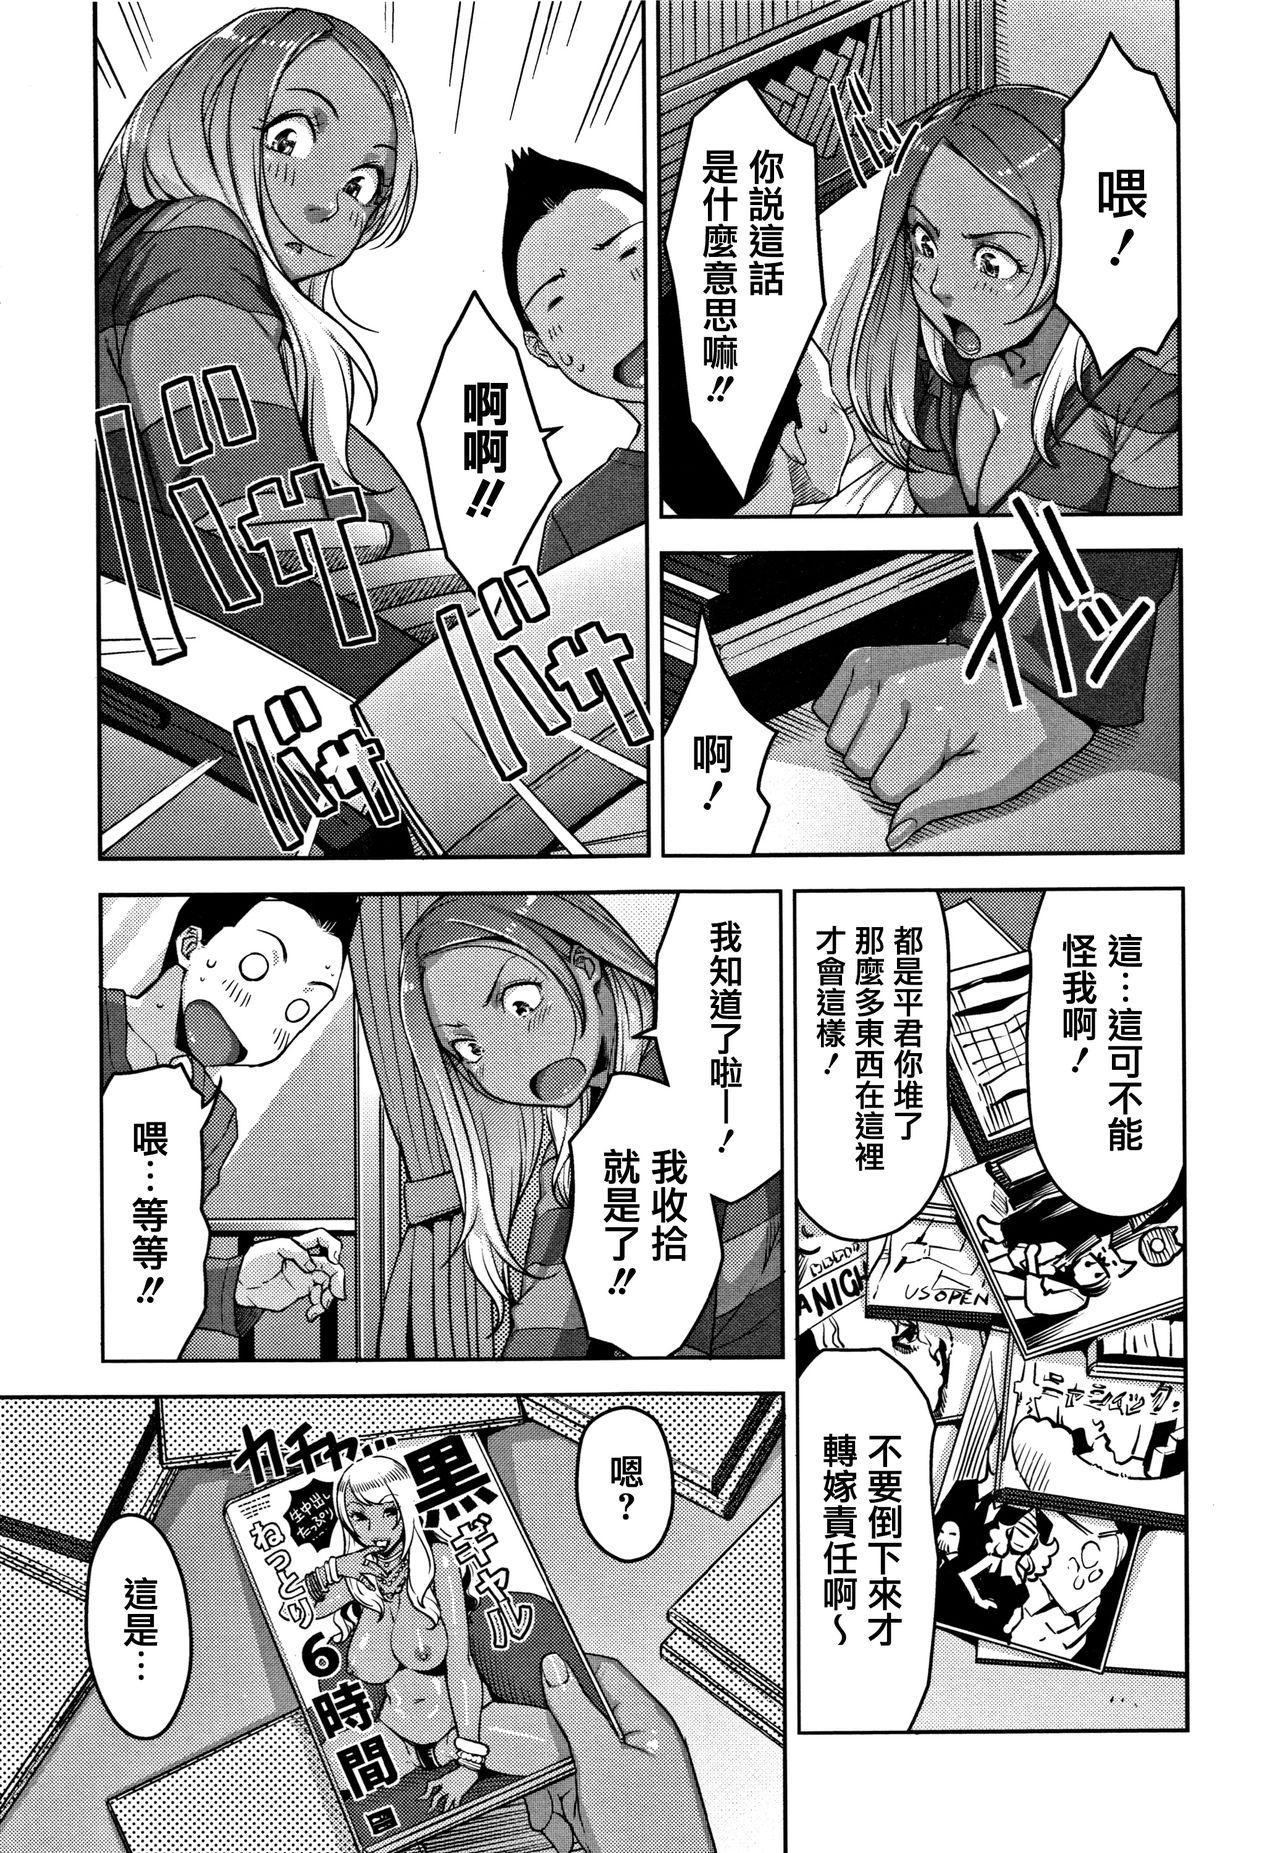 Kanjyuku Chijyo 116